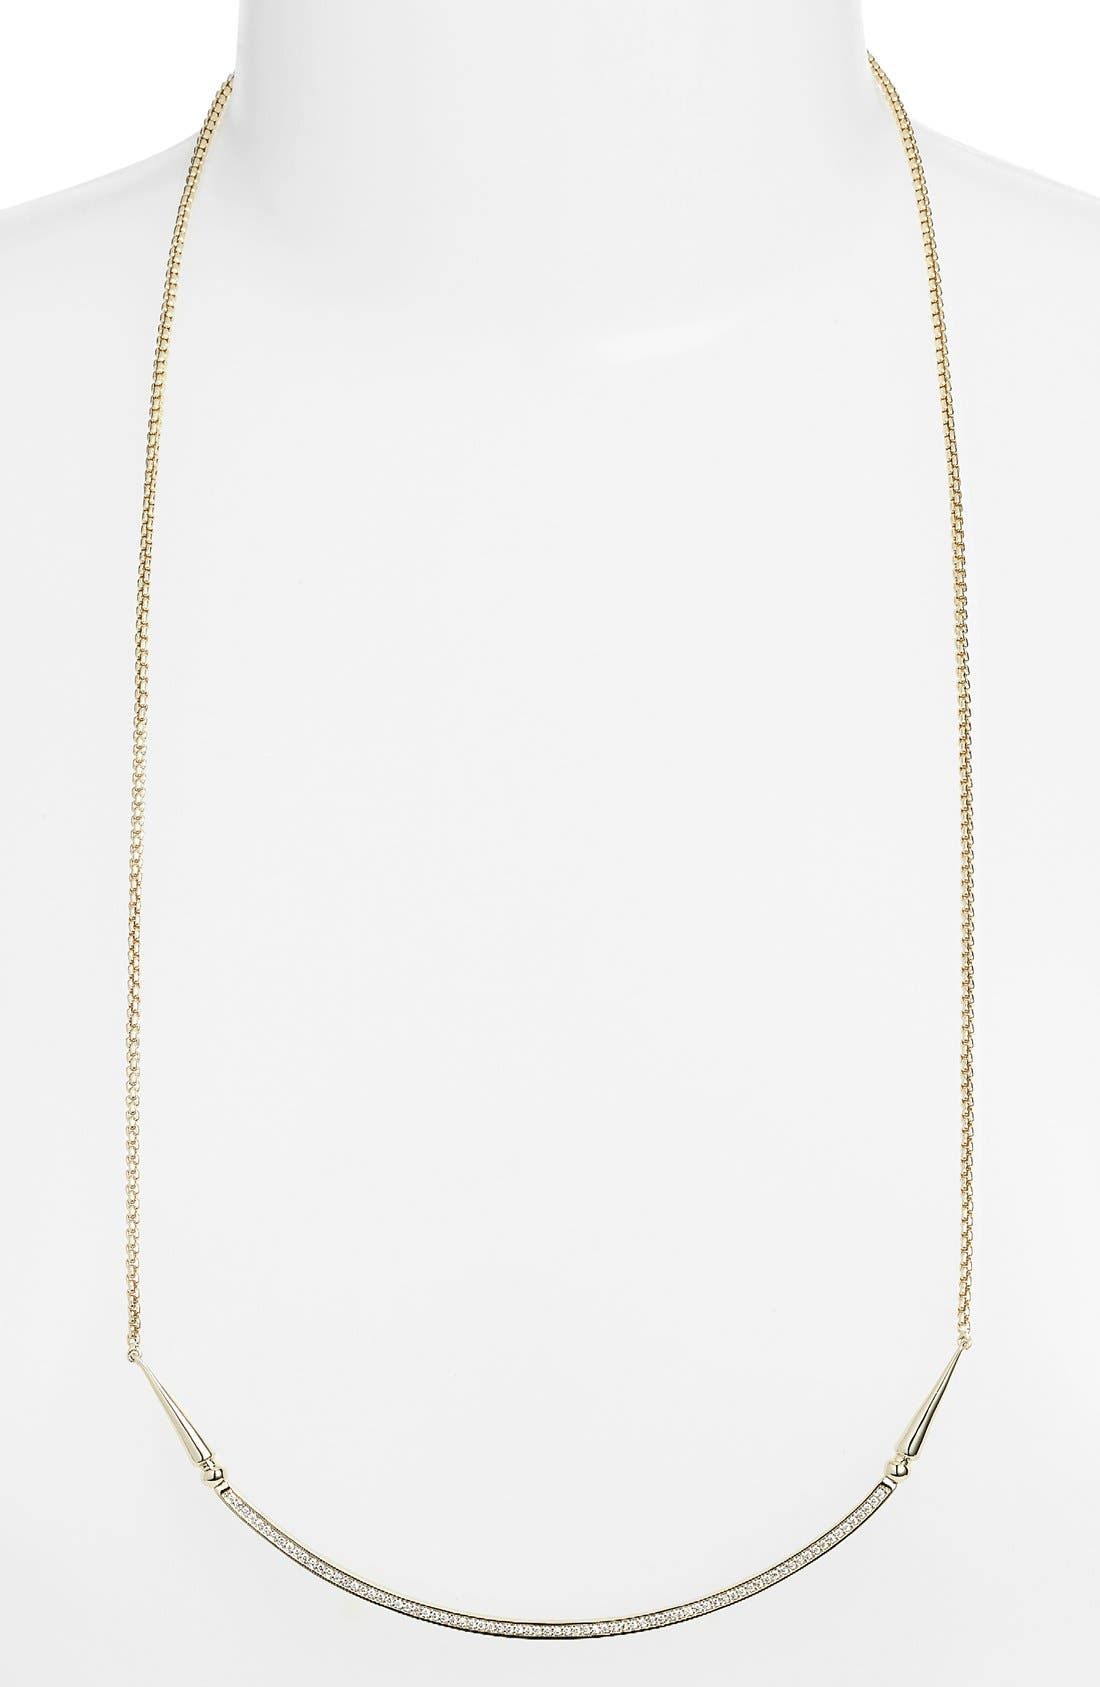 Main Image - Kendra Scott 'Scottie' Pendant Necklace